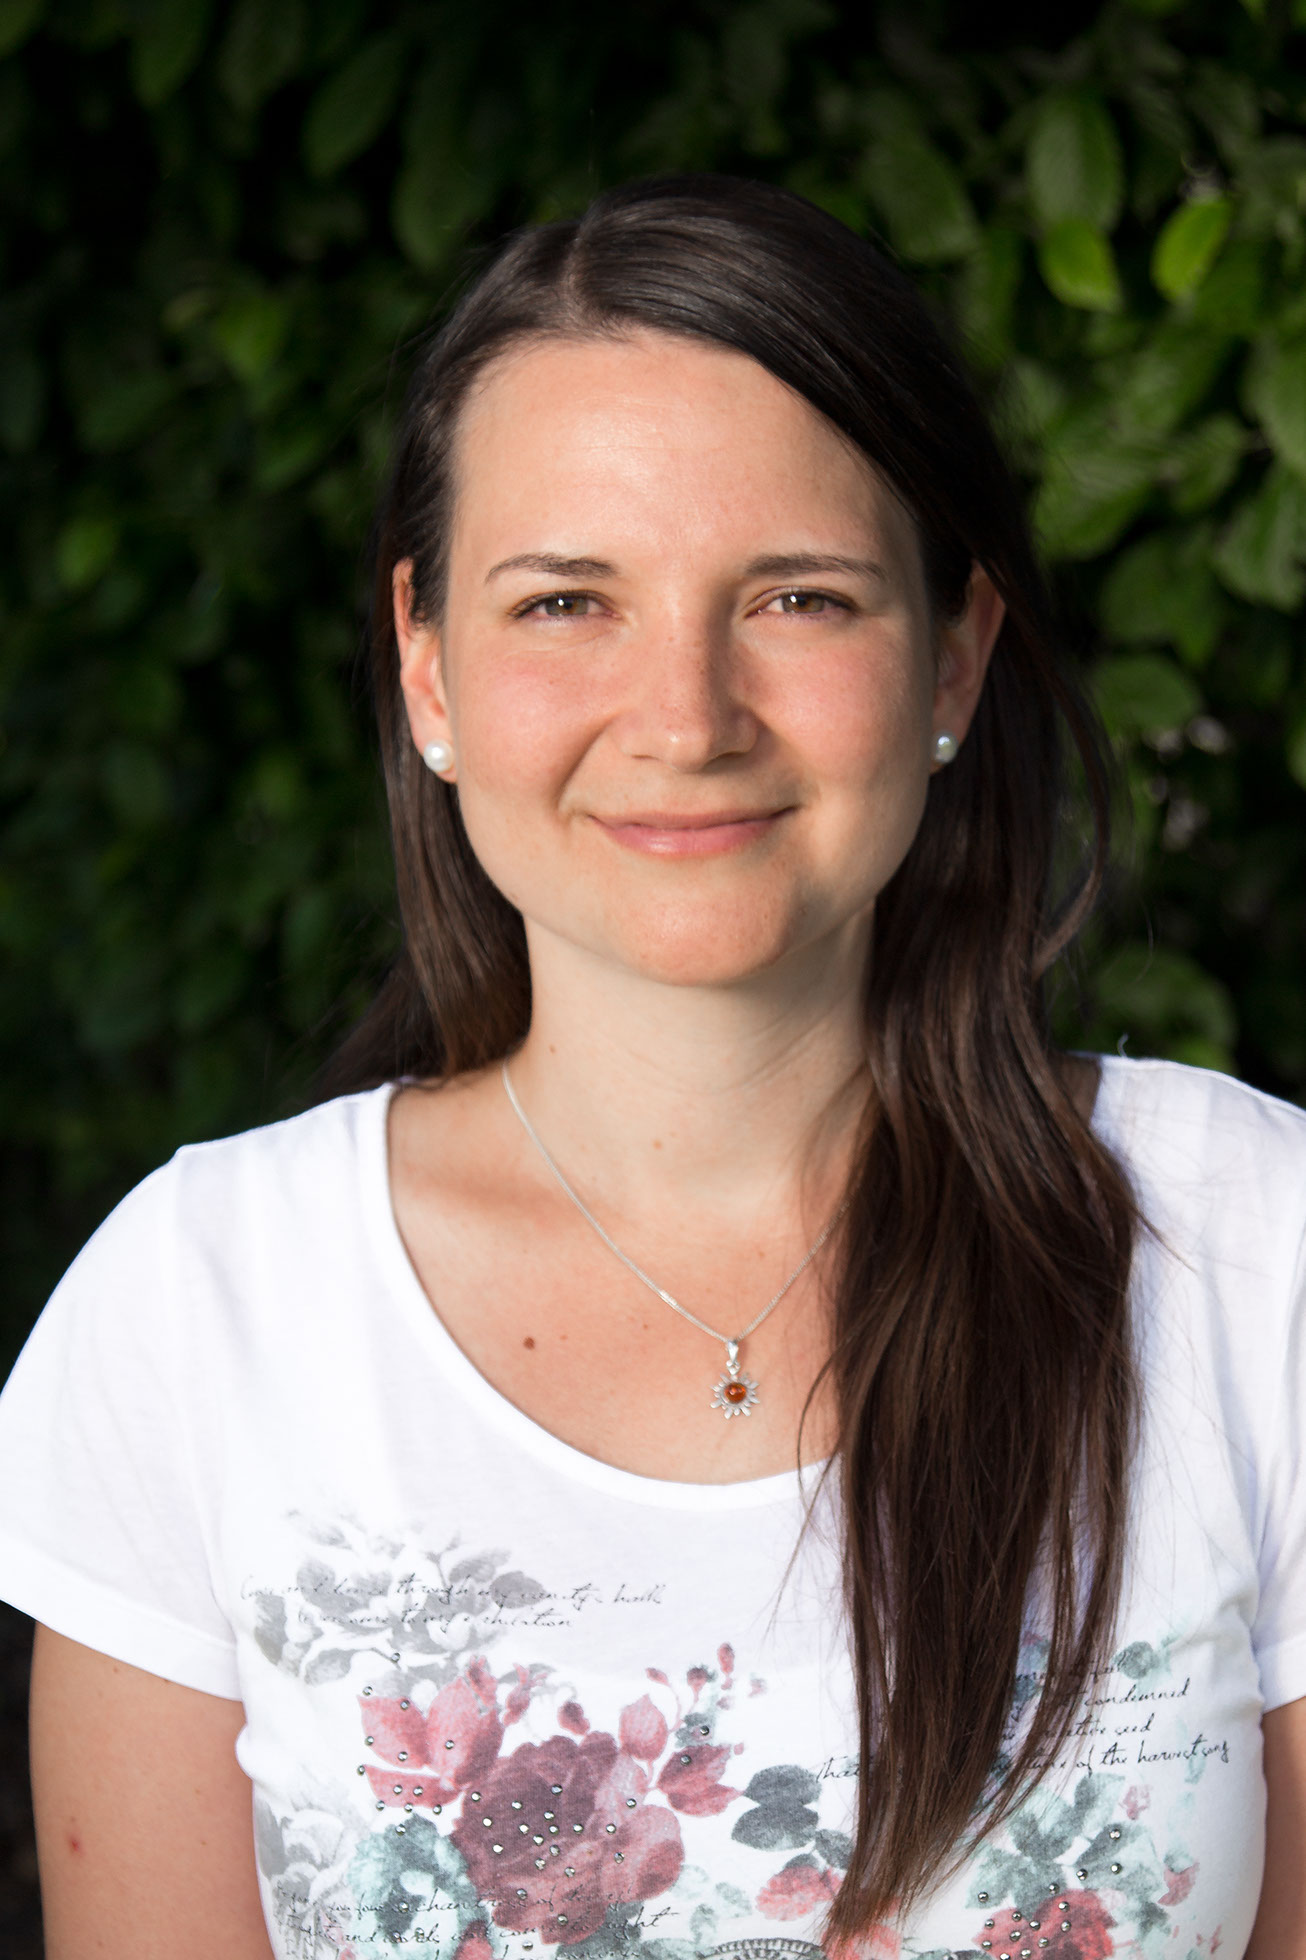 Karin Maurer